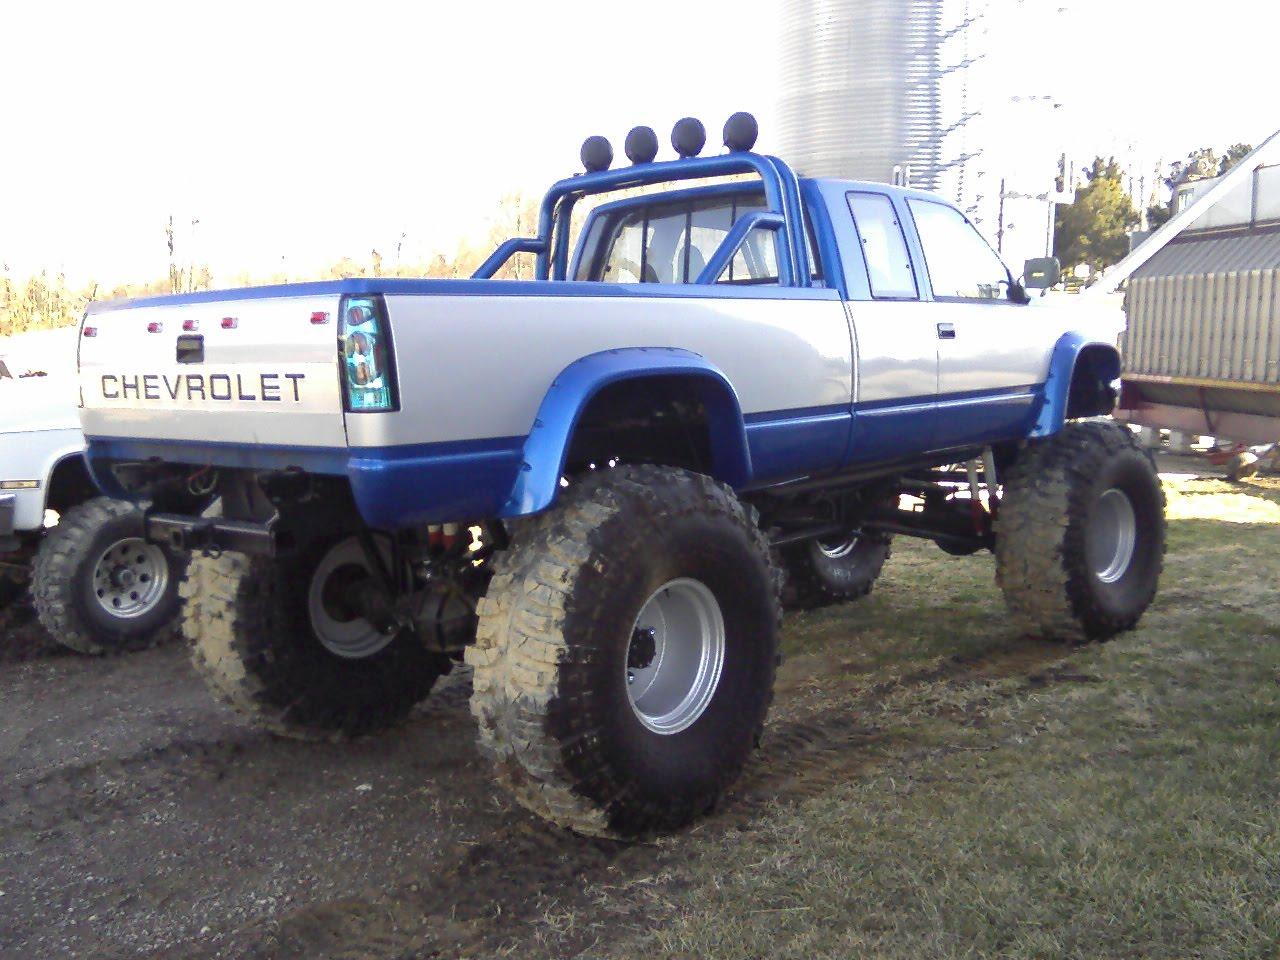 jacked up chevy trucks mudding - photo #25